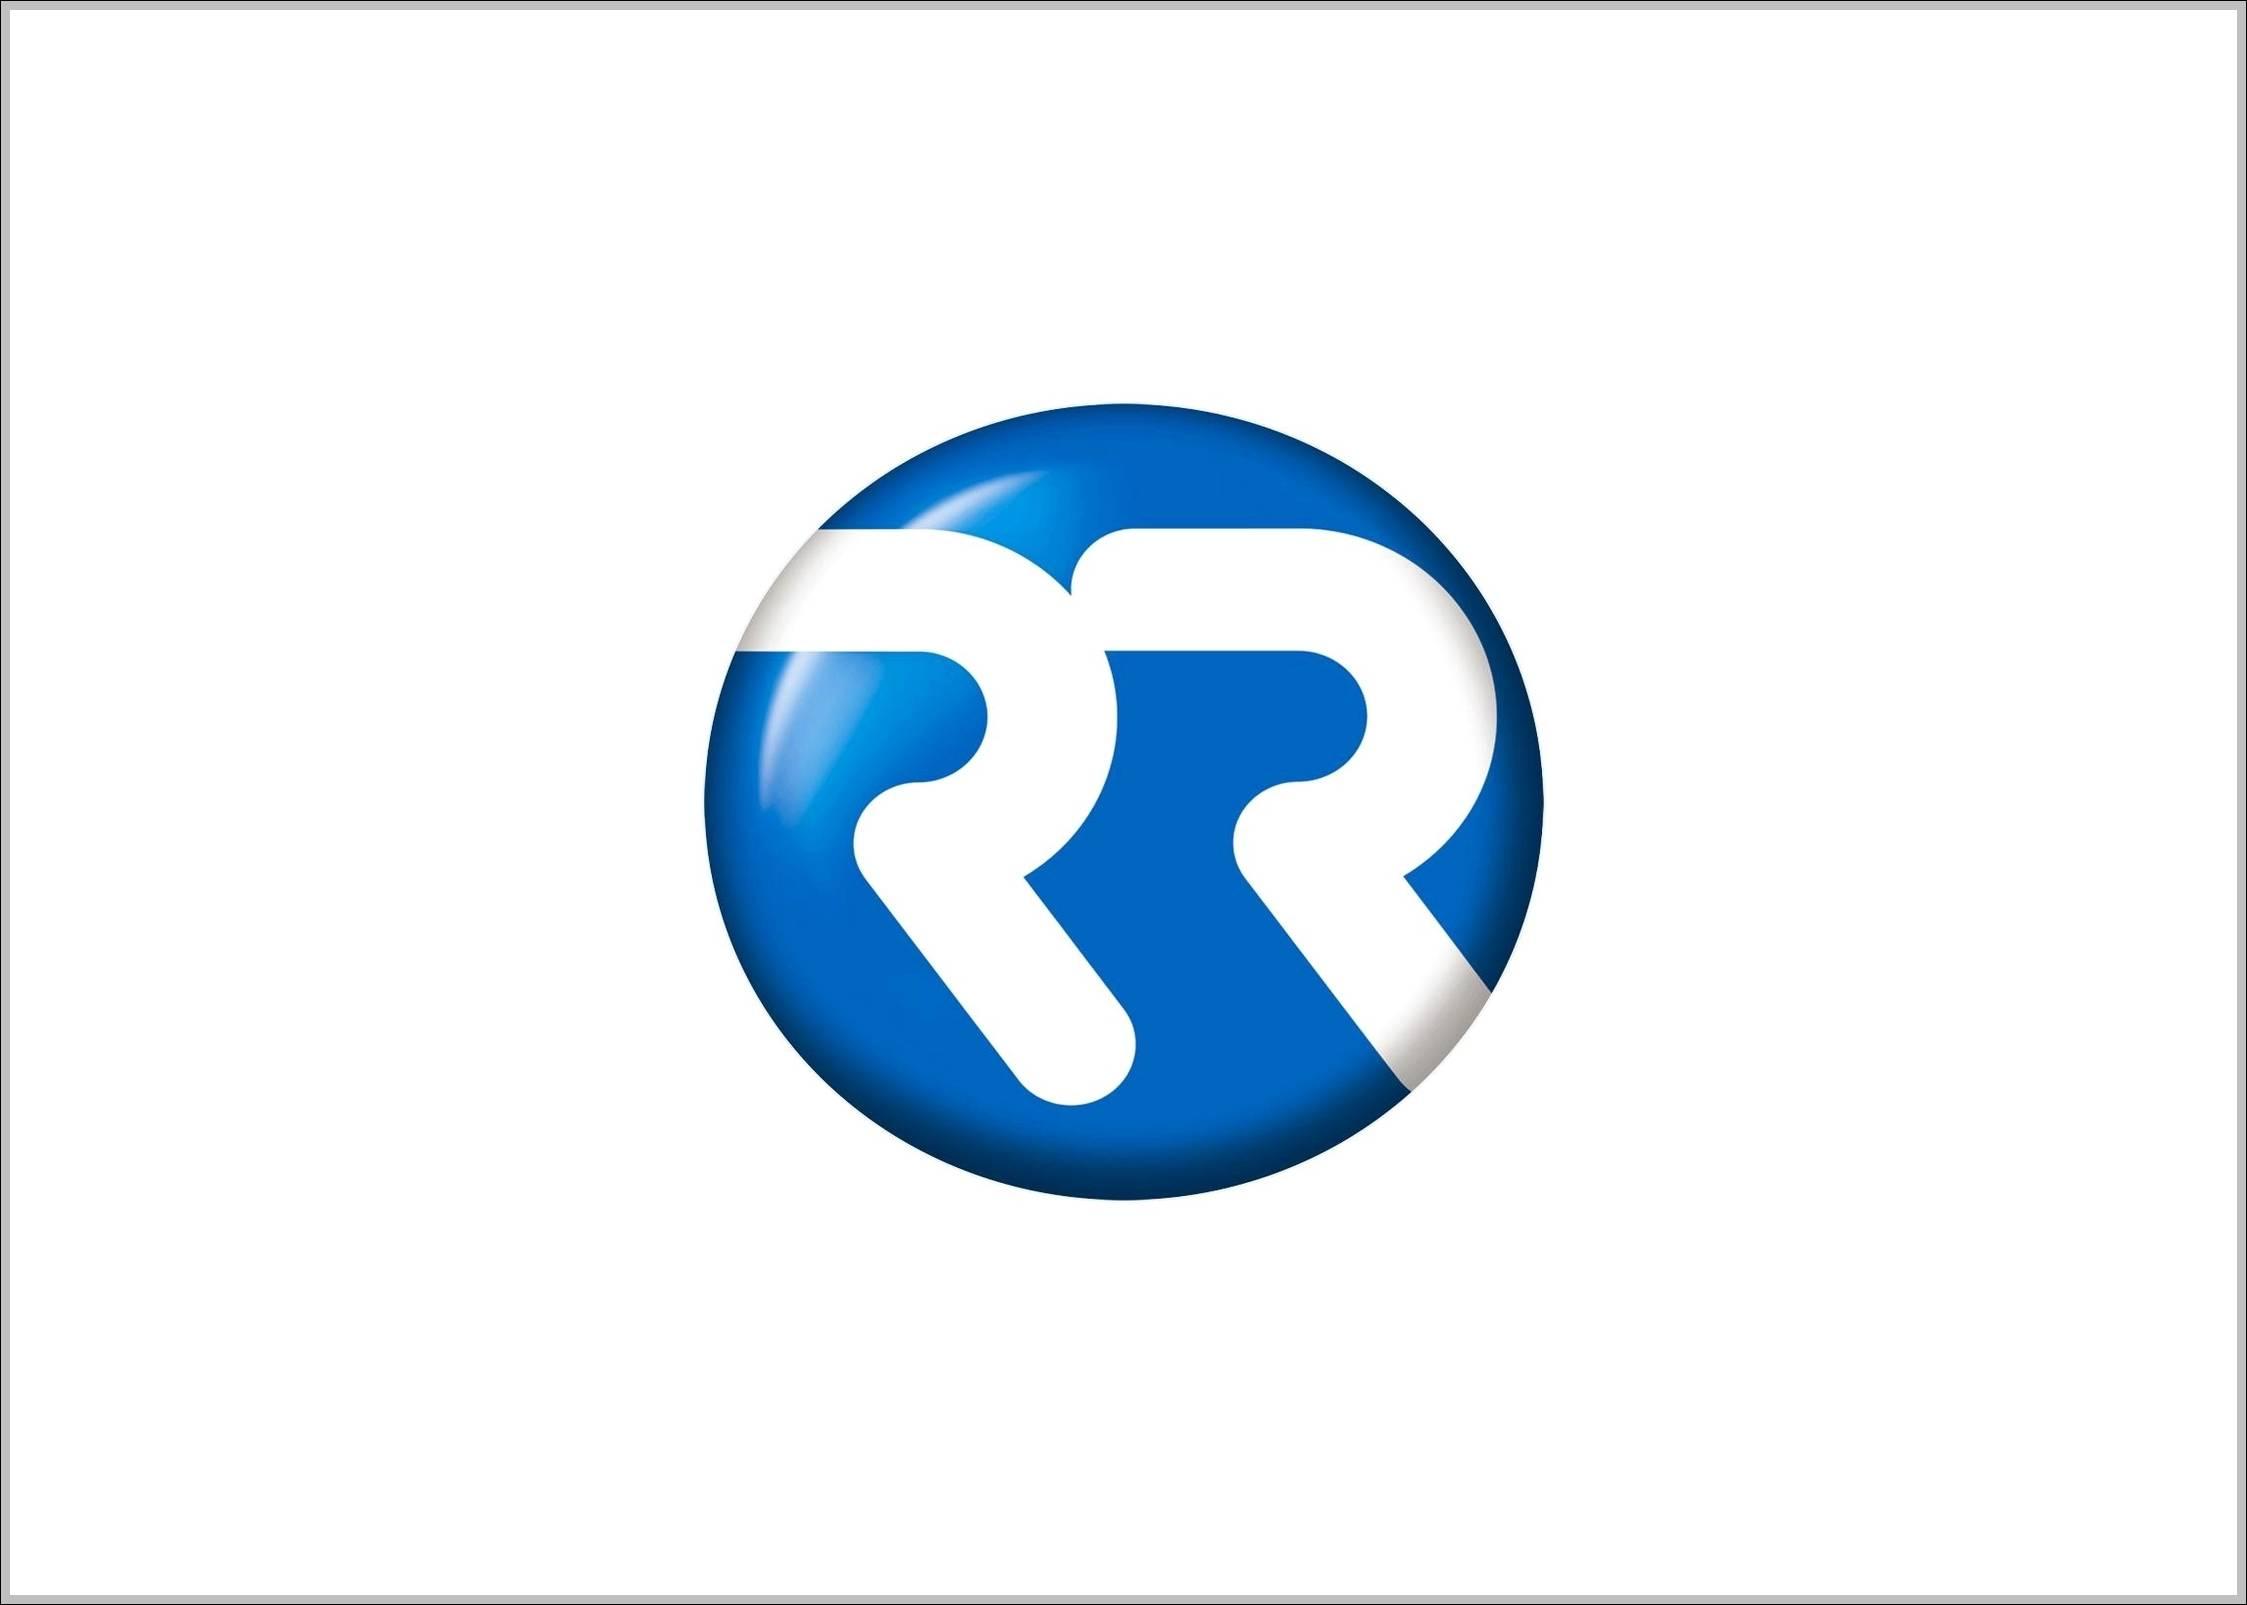 Radio Renascenca logo